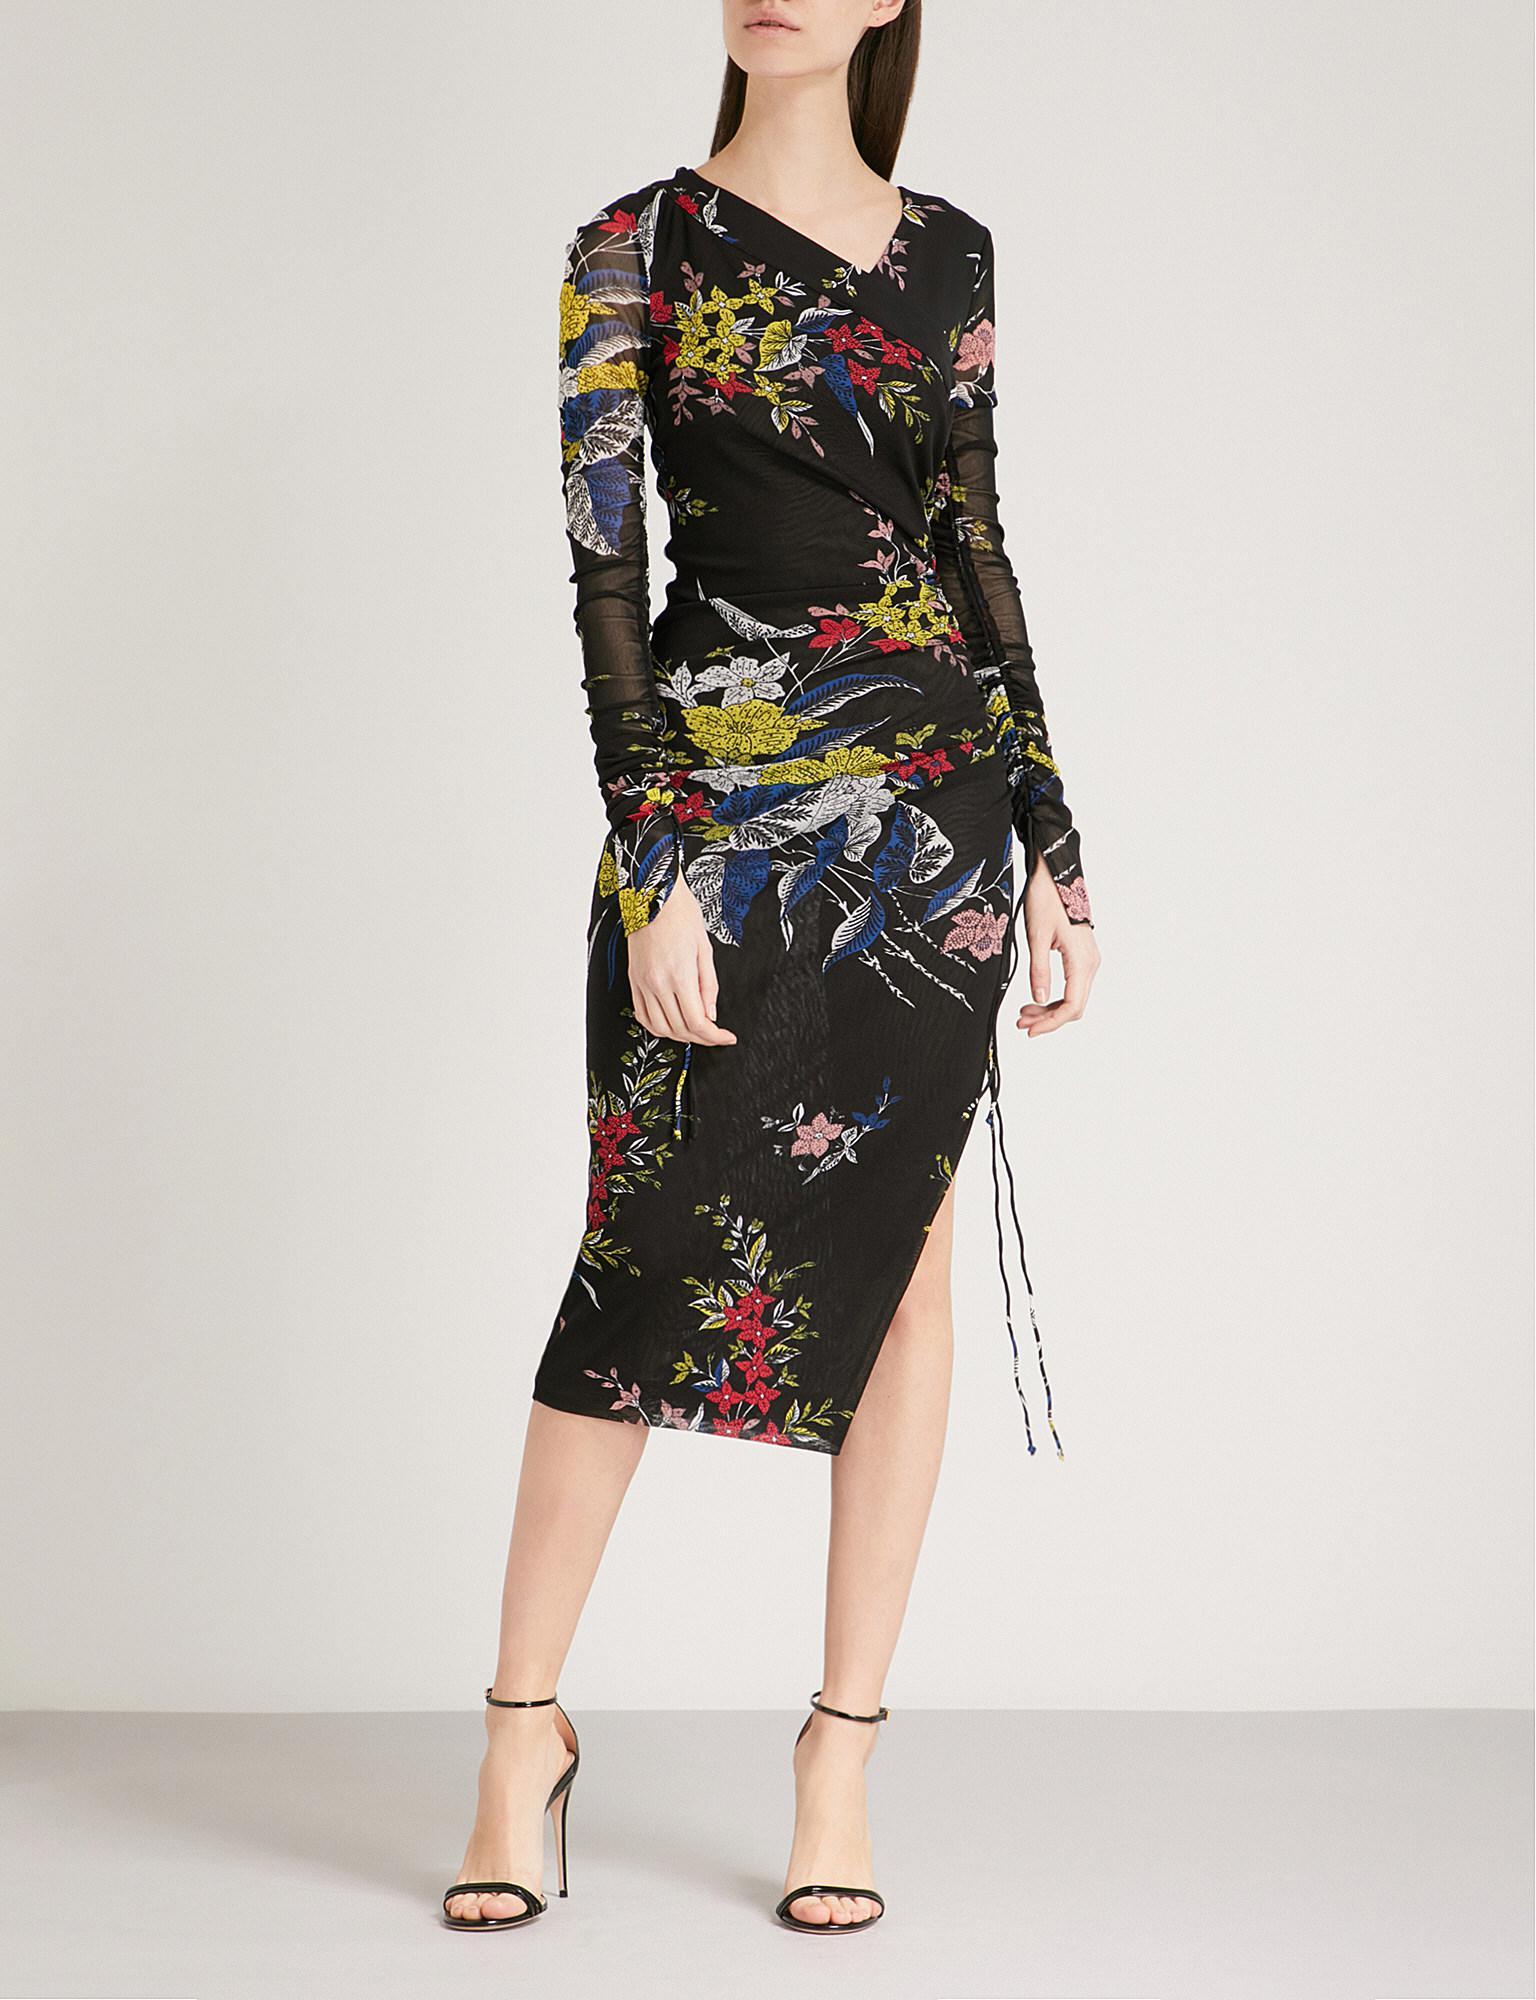 Fürstenberg estampado Diane Vestido malla floral de Von qwf4TY